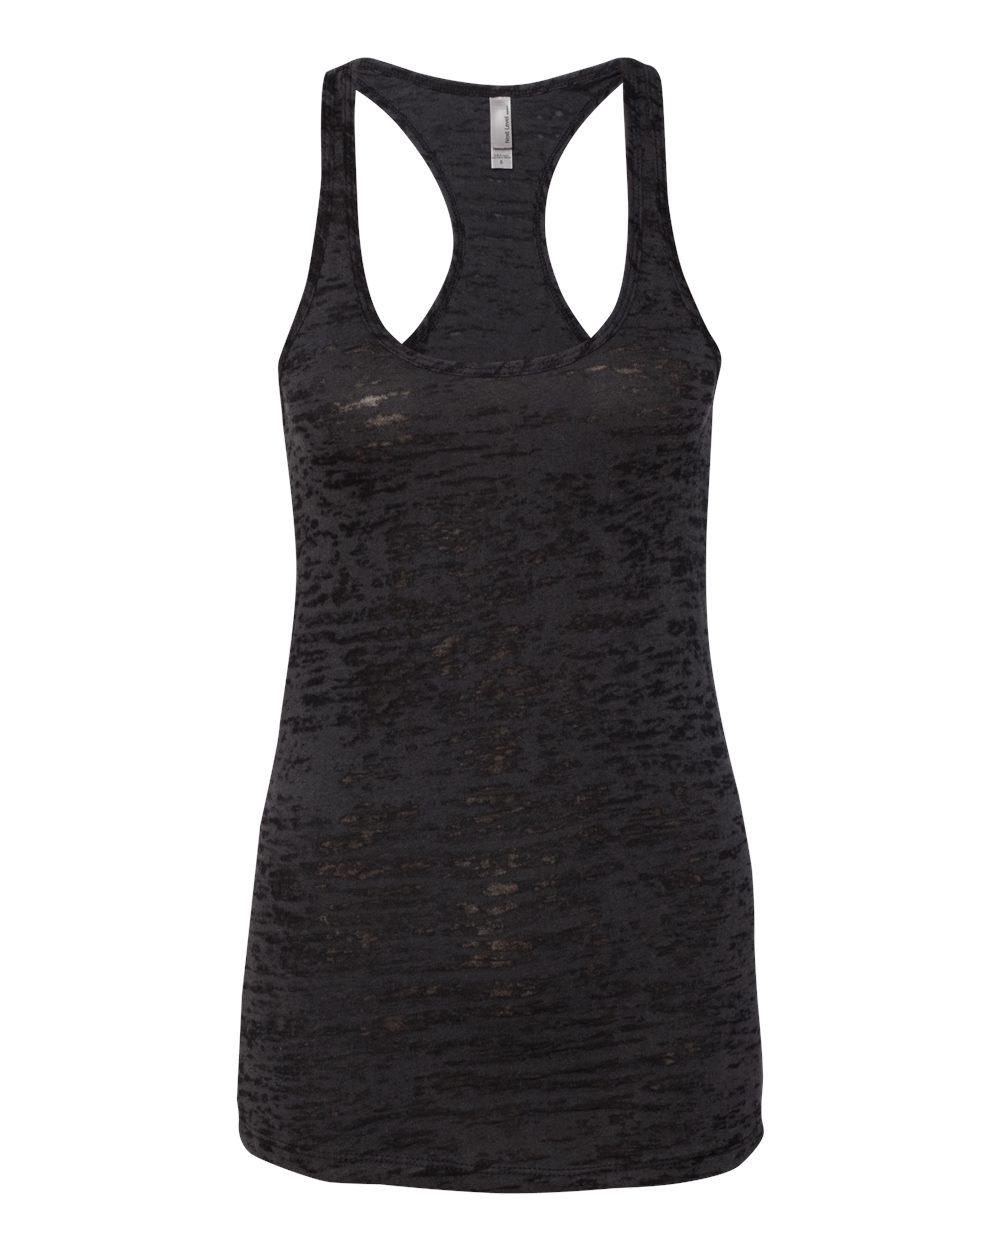 Next Level Women's Burnout Racerback Tank Top Shirt Blank